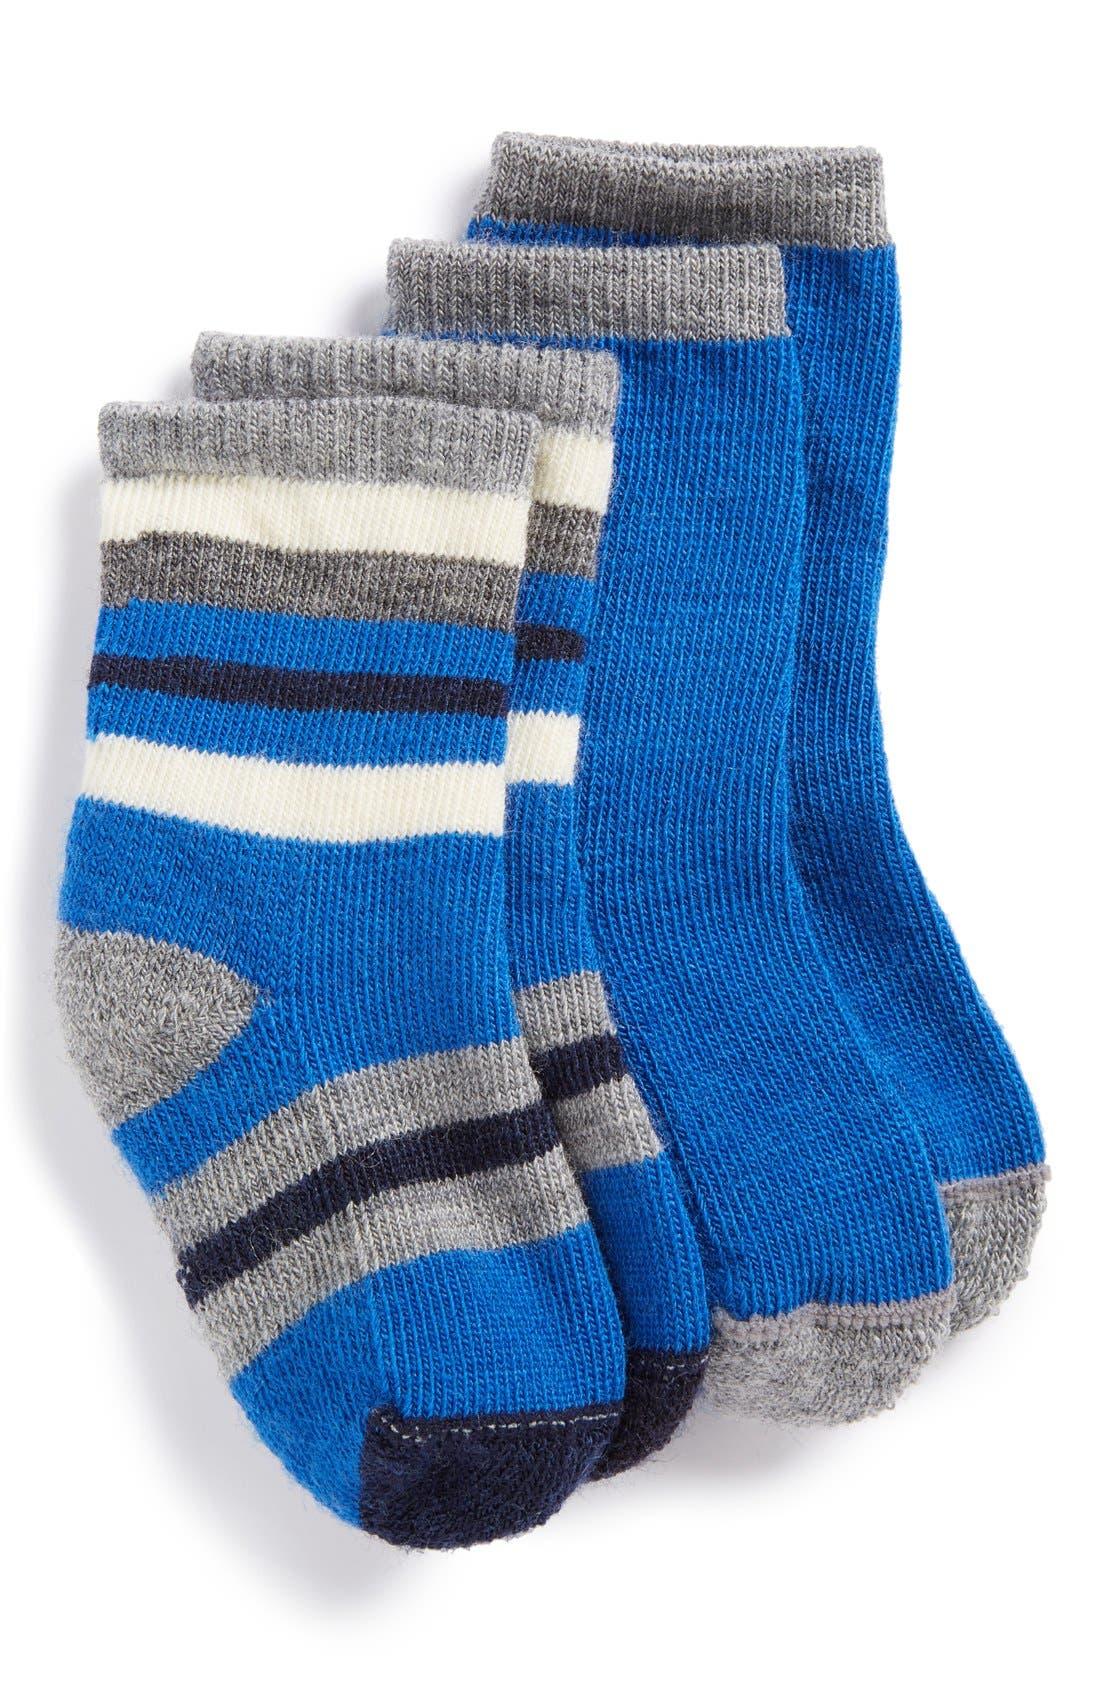 'Cozy Baby' Socks,                             Main thumbnail 1, color,                             400